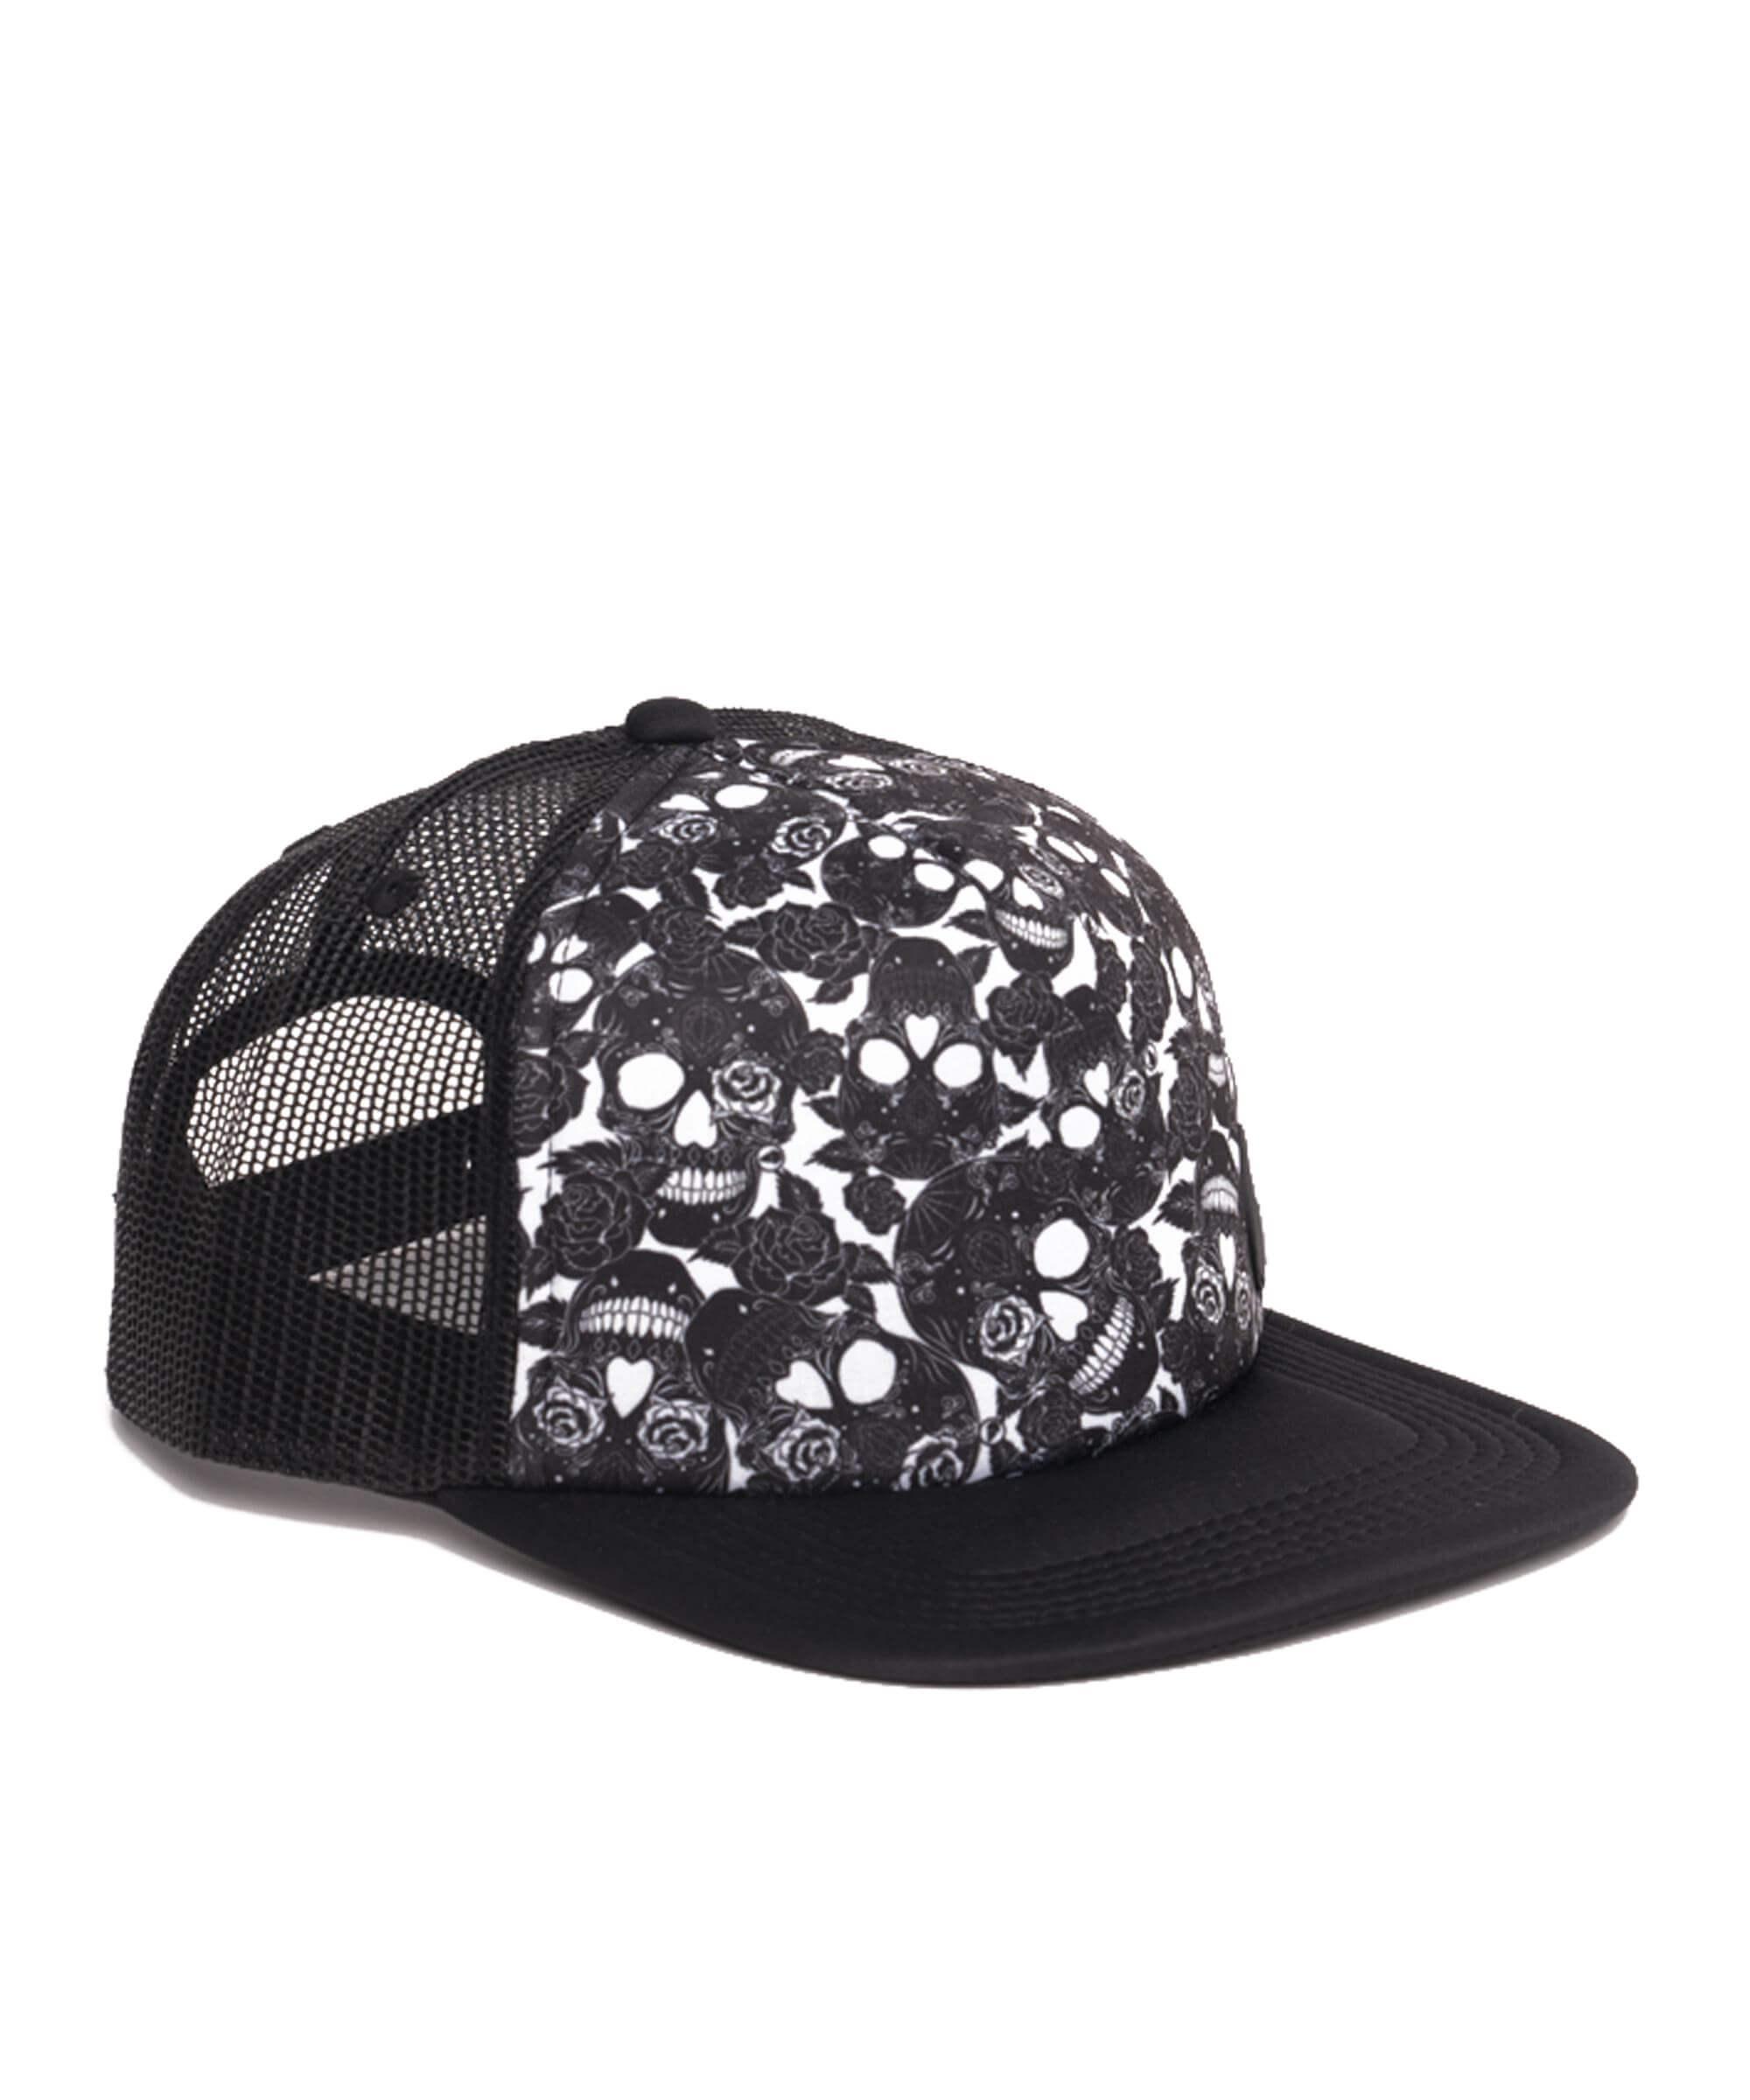 SUGAR CRANE CAP BLACK